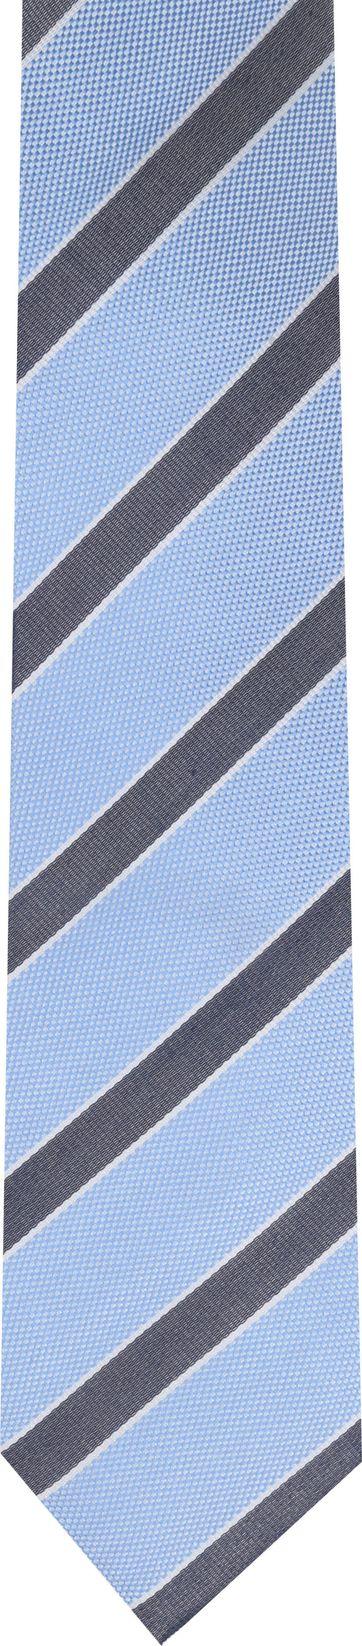 Suitable Tie Light Blue F01-27